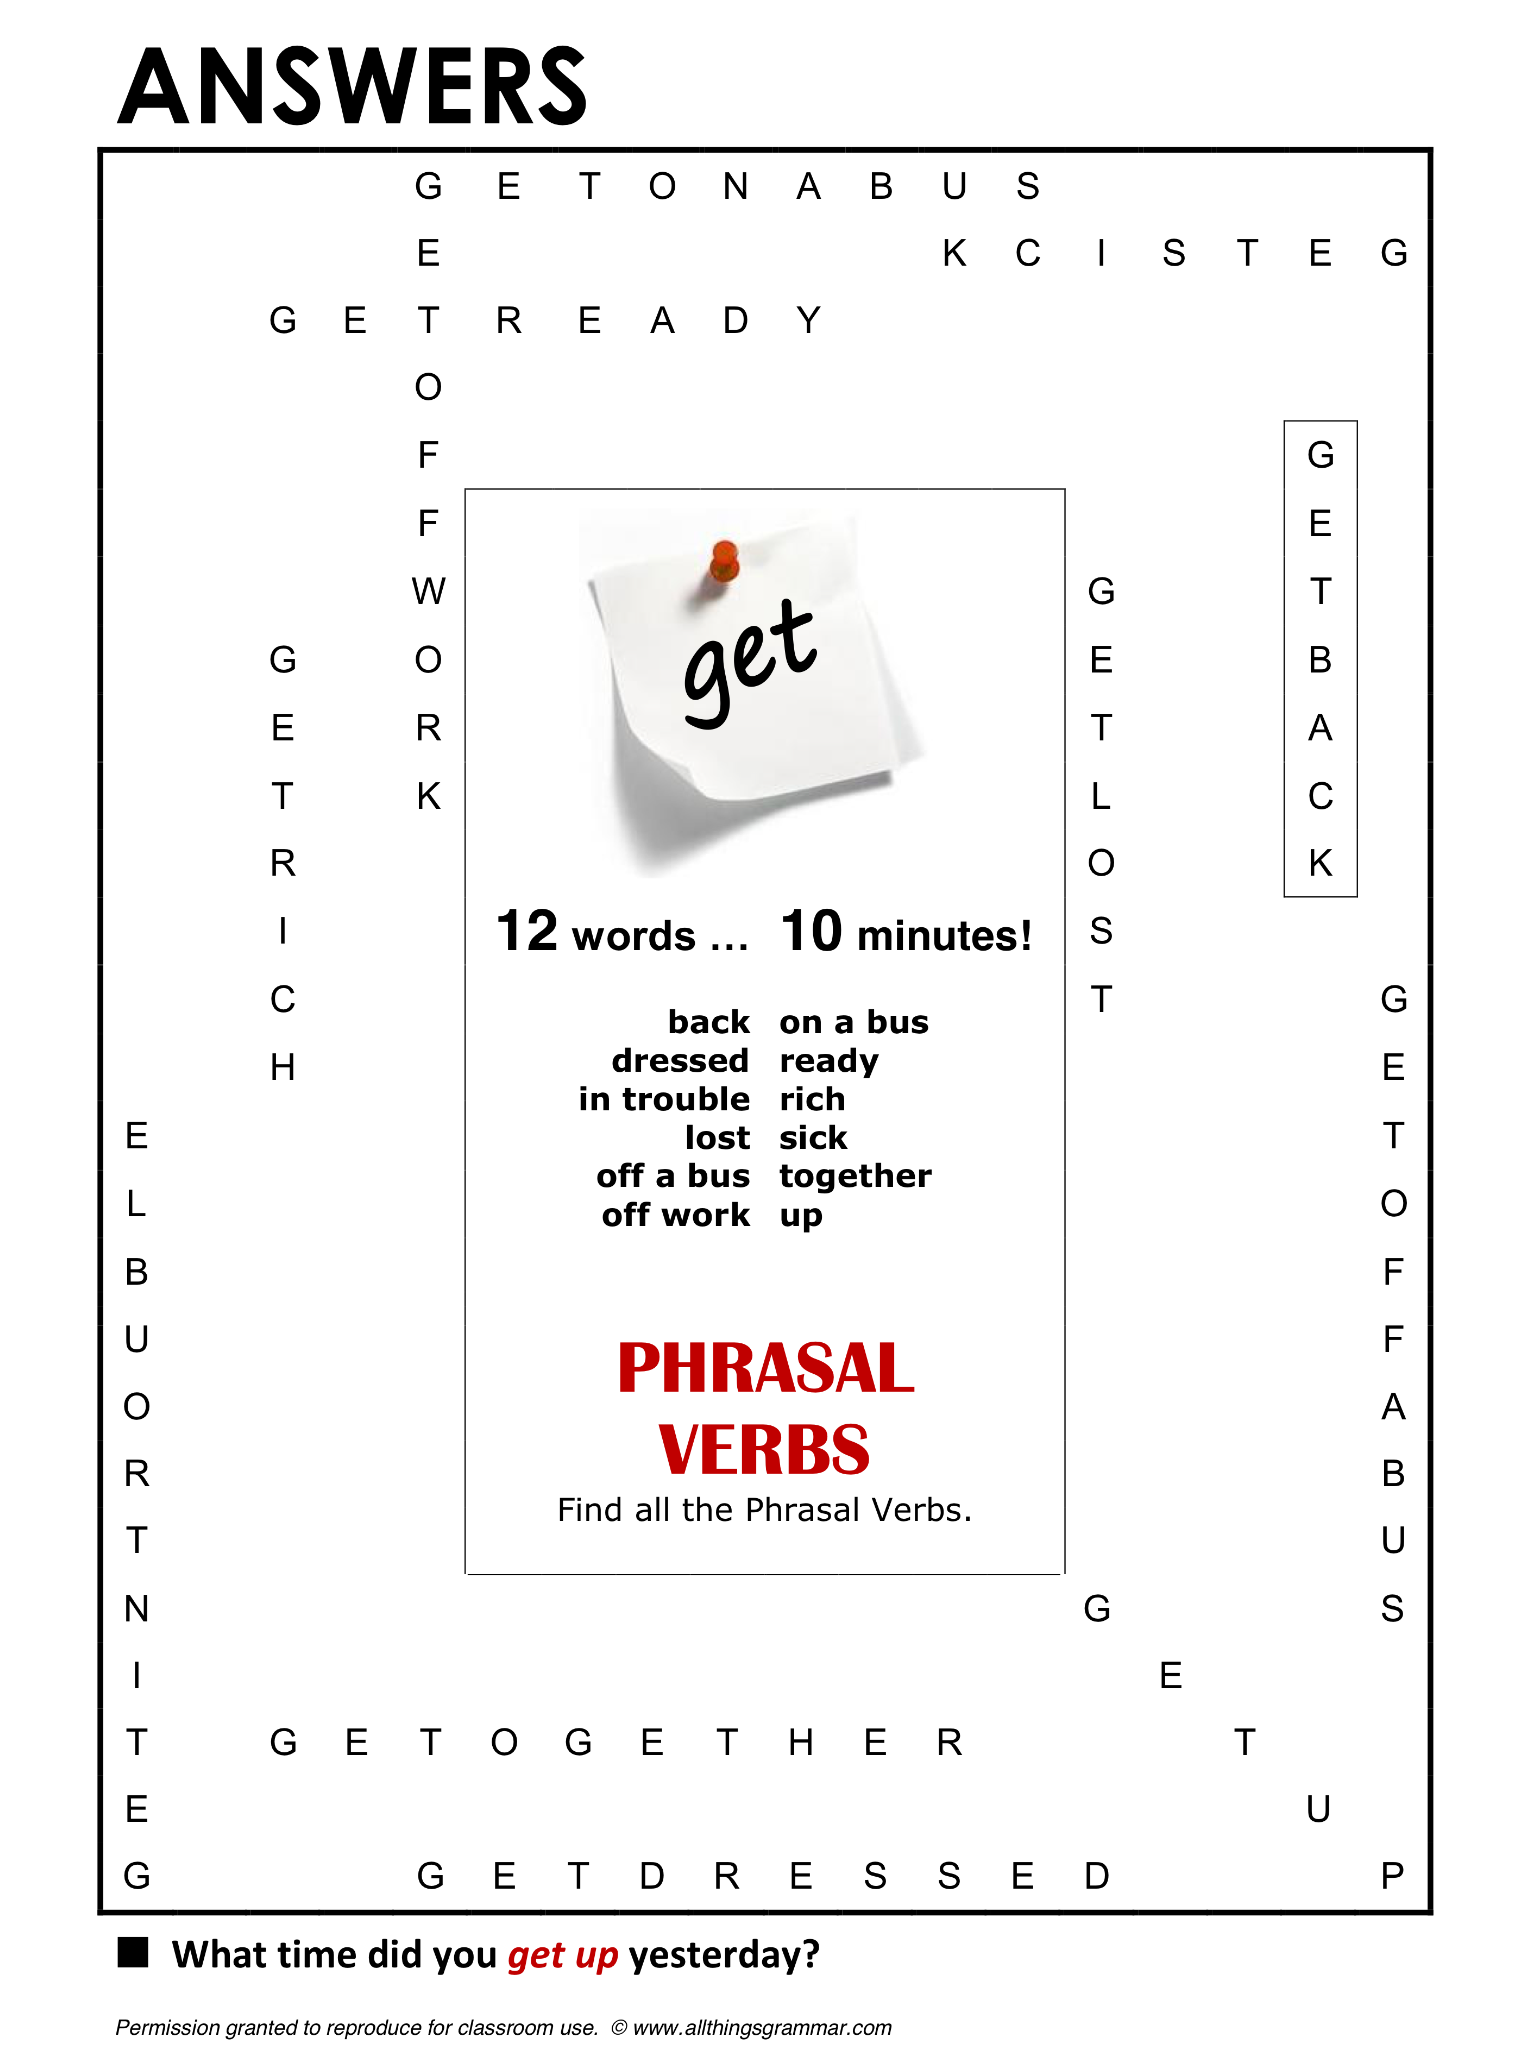 English Grammar Phrasal Verbs With Get